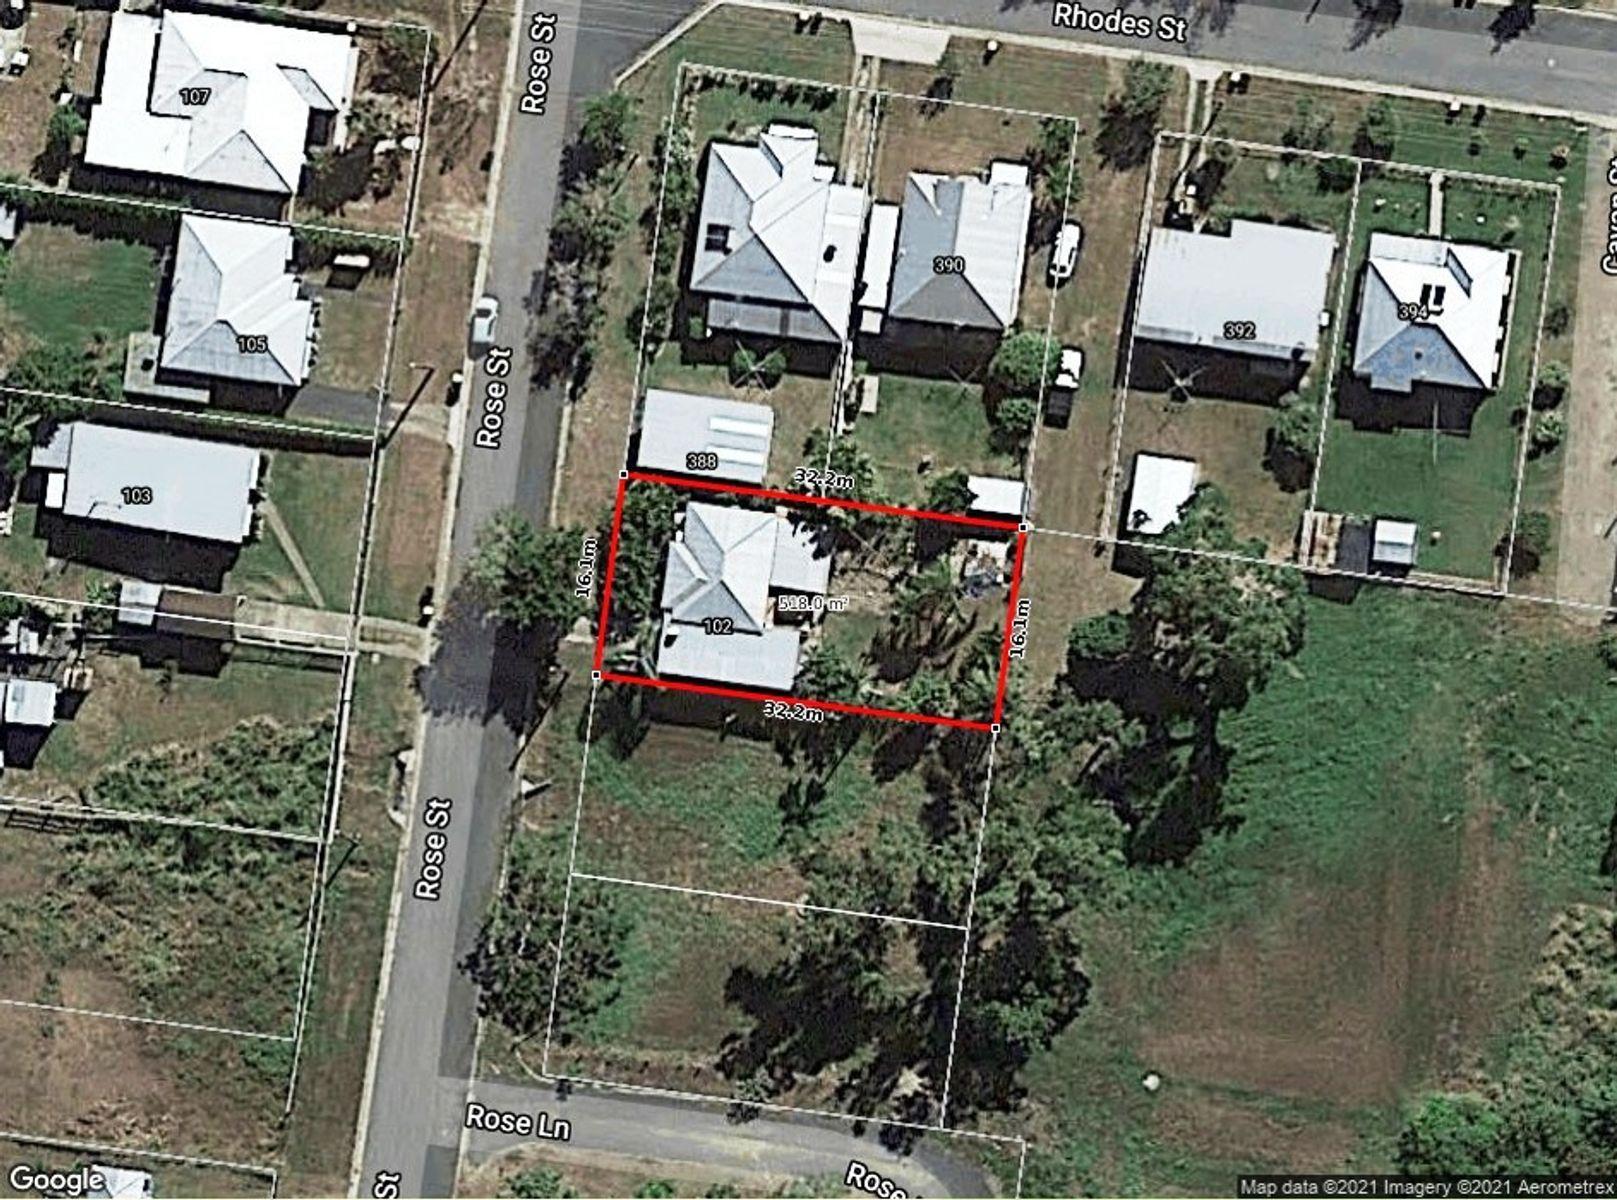 102 Rose Street, Koongal, QLD 4701